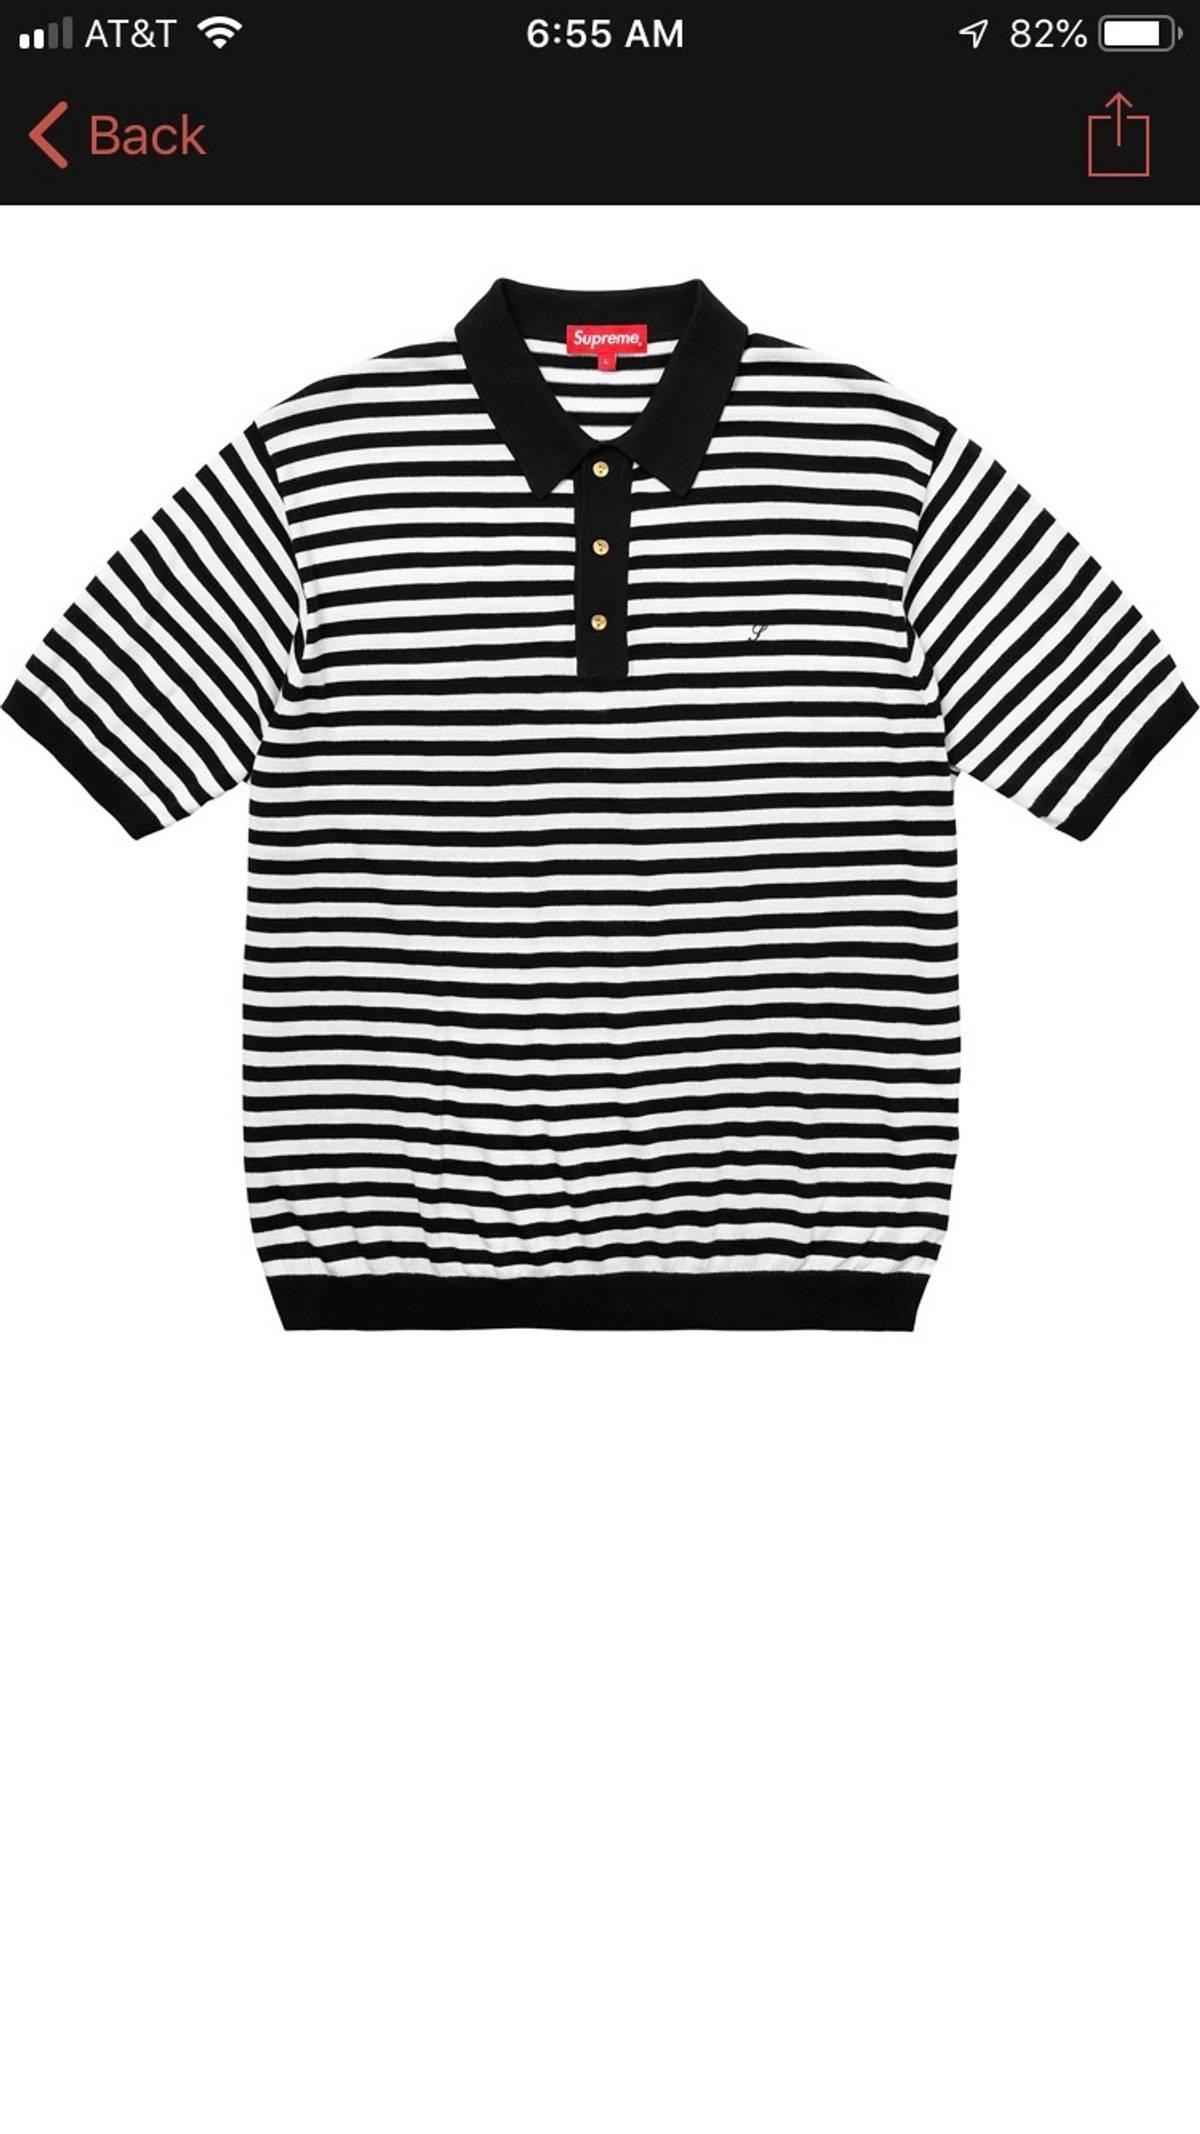 3fedc1b36e Supreme Striped Knit Polo | Grailed